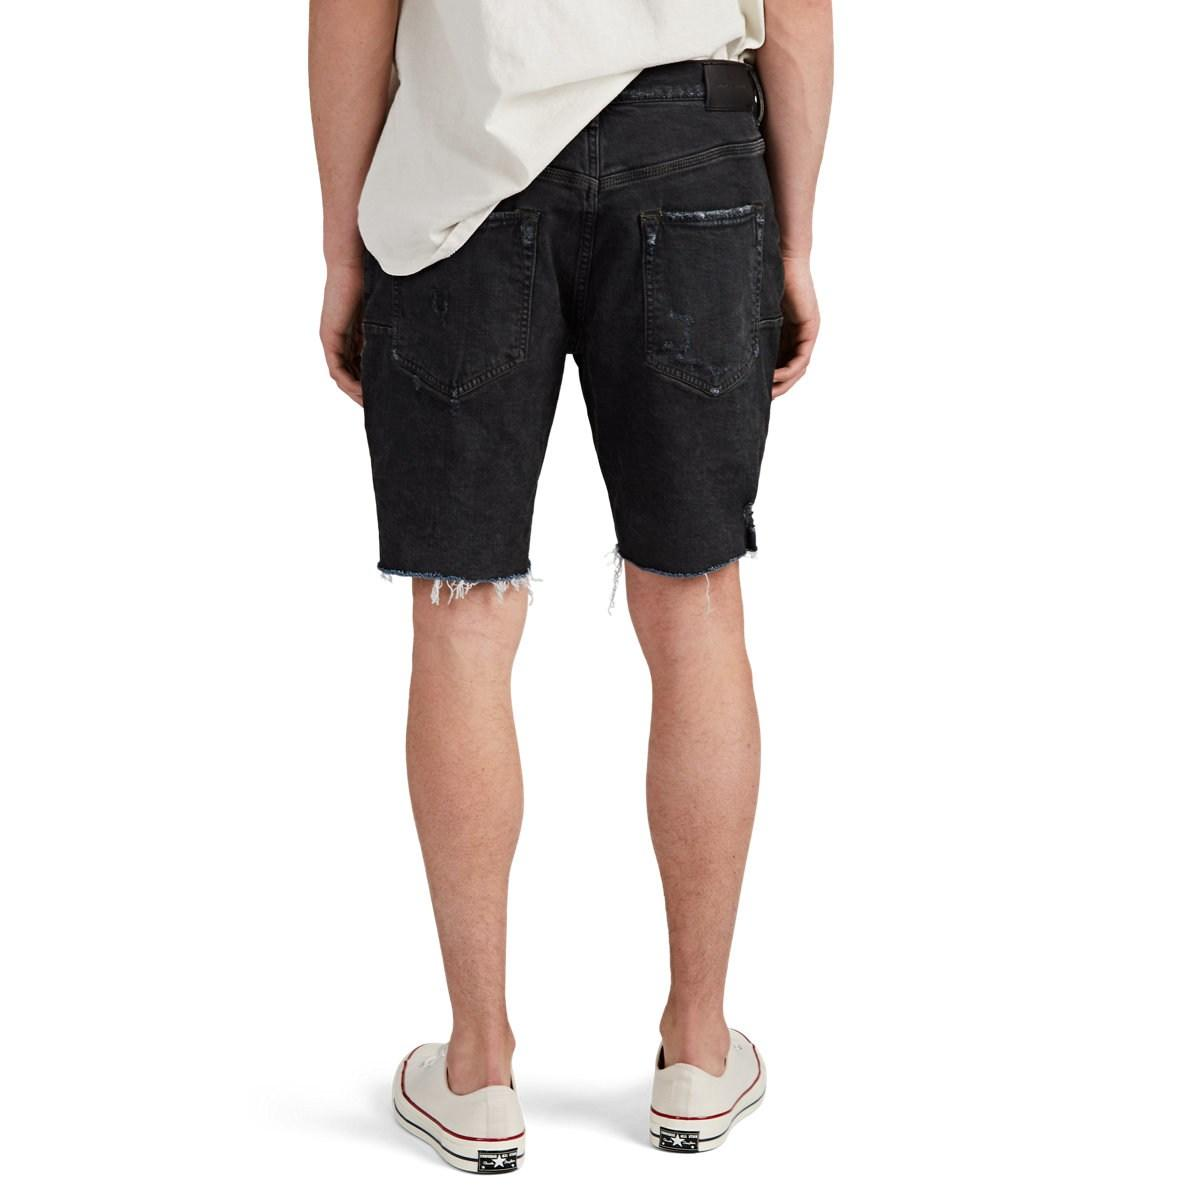 0b7504969724 Purple - Black Dyed Distressed Denim Cutoff Shorts for Men - Lyst. View  fullscreen